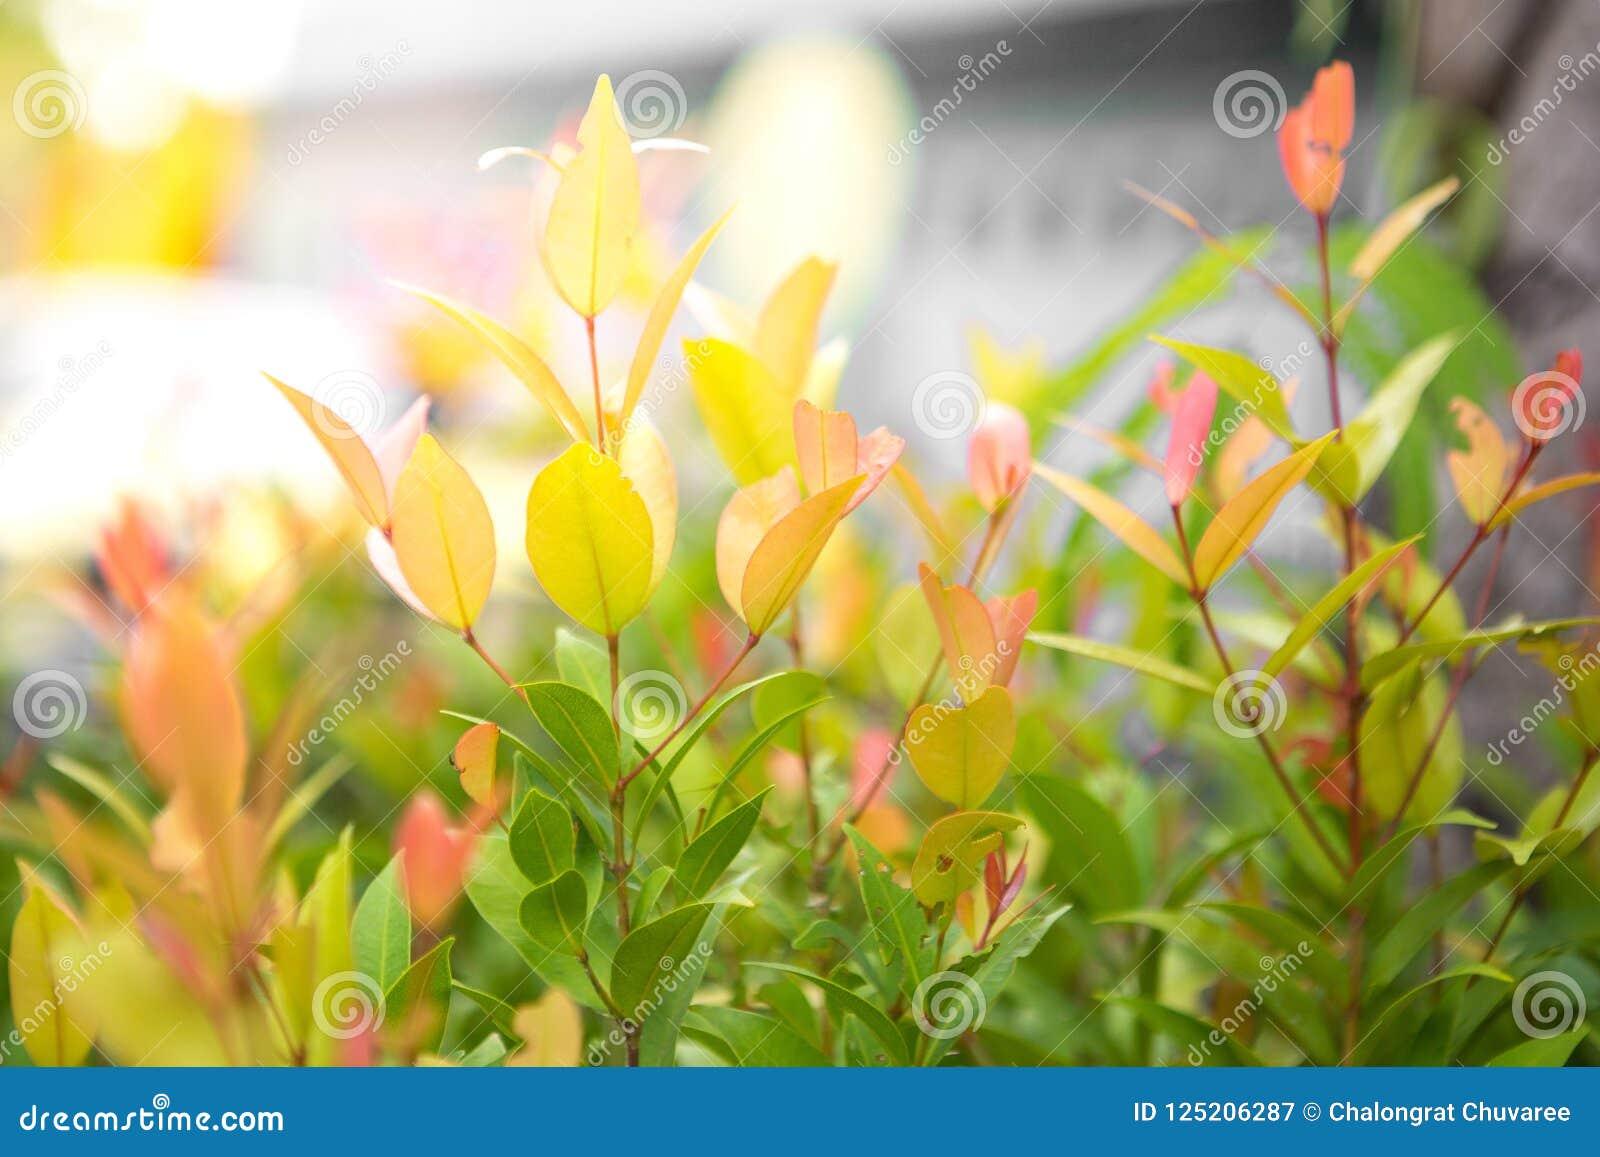 Green shrubs With sunlight